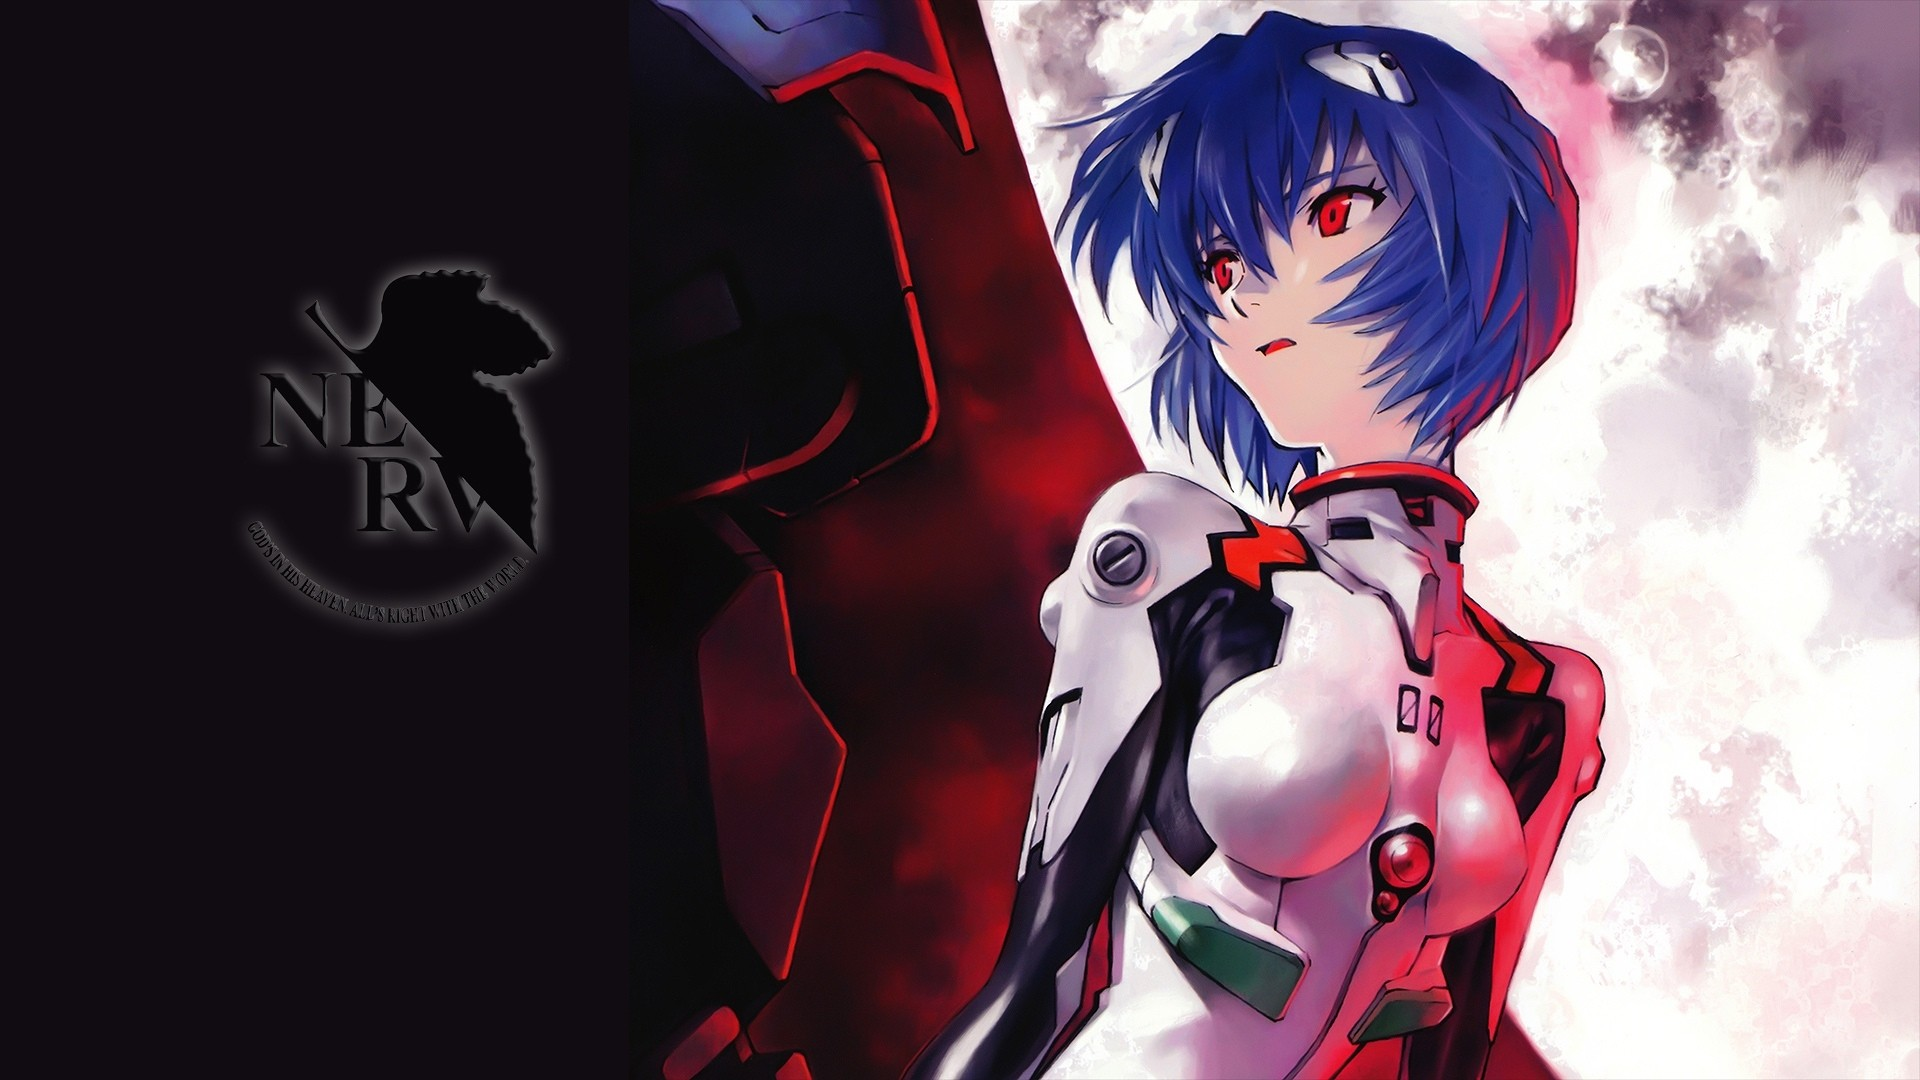 Evangelion Rei Wallpaper Image